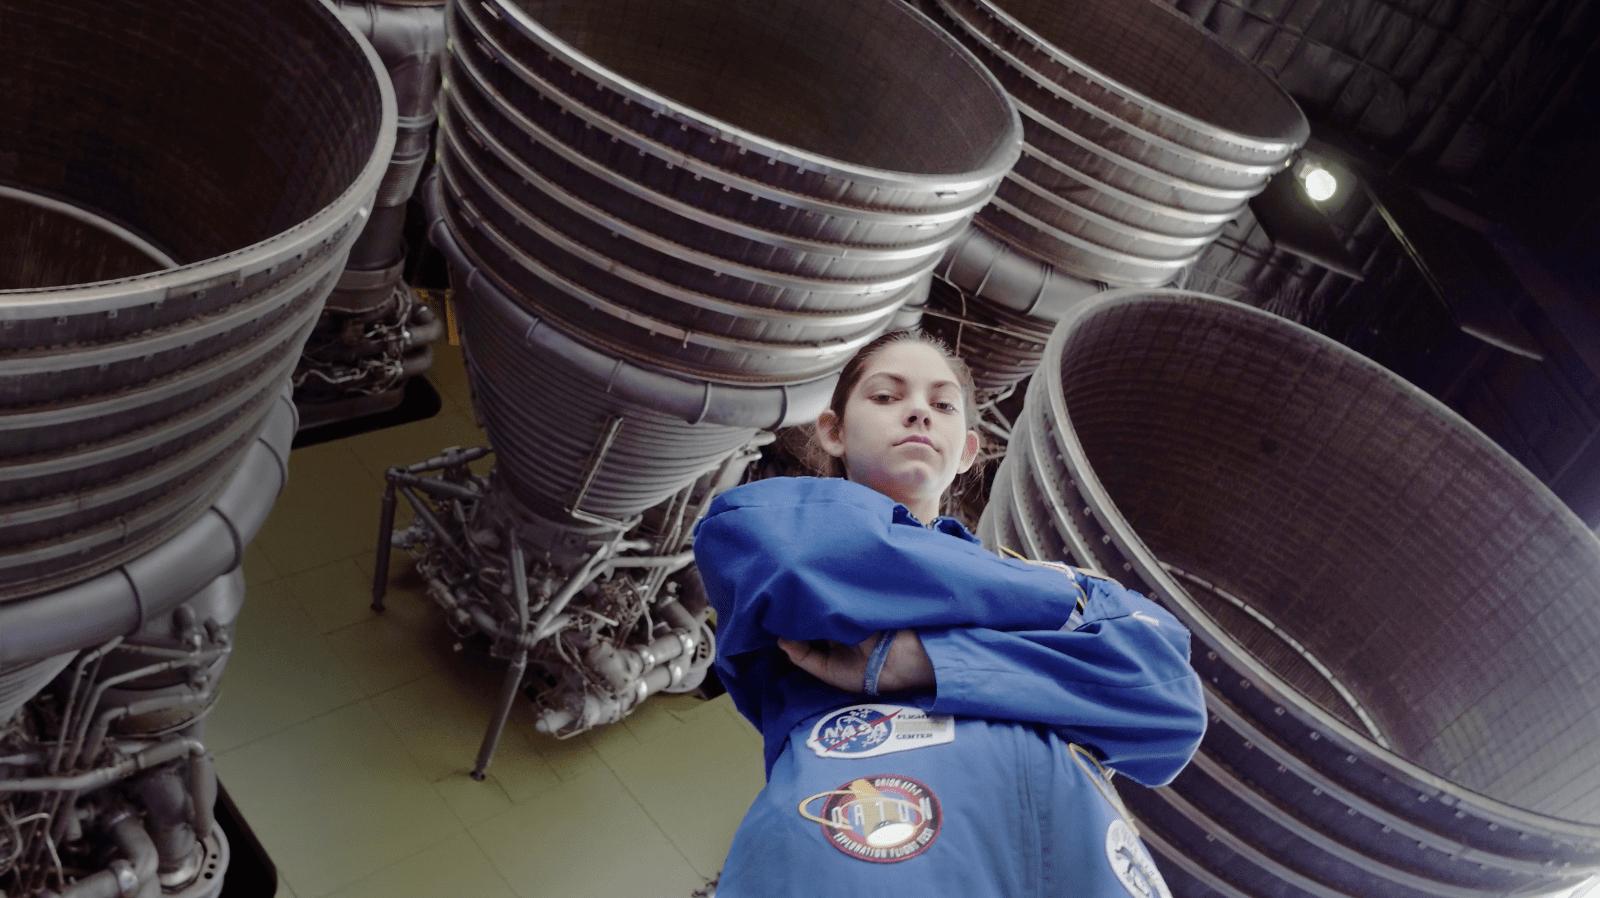 space enthusiast Alyssa Carson